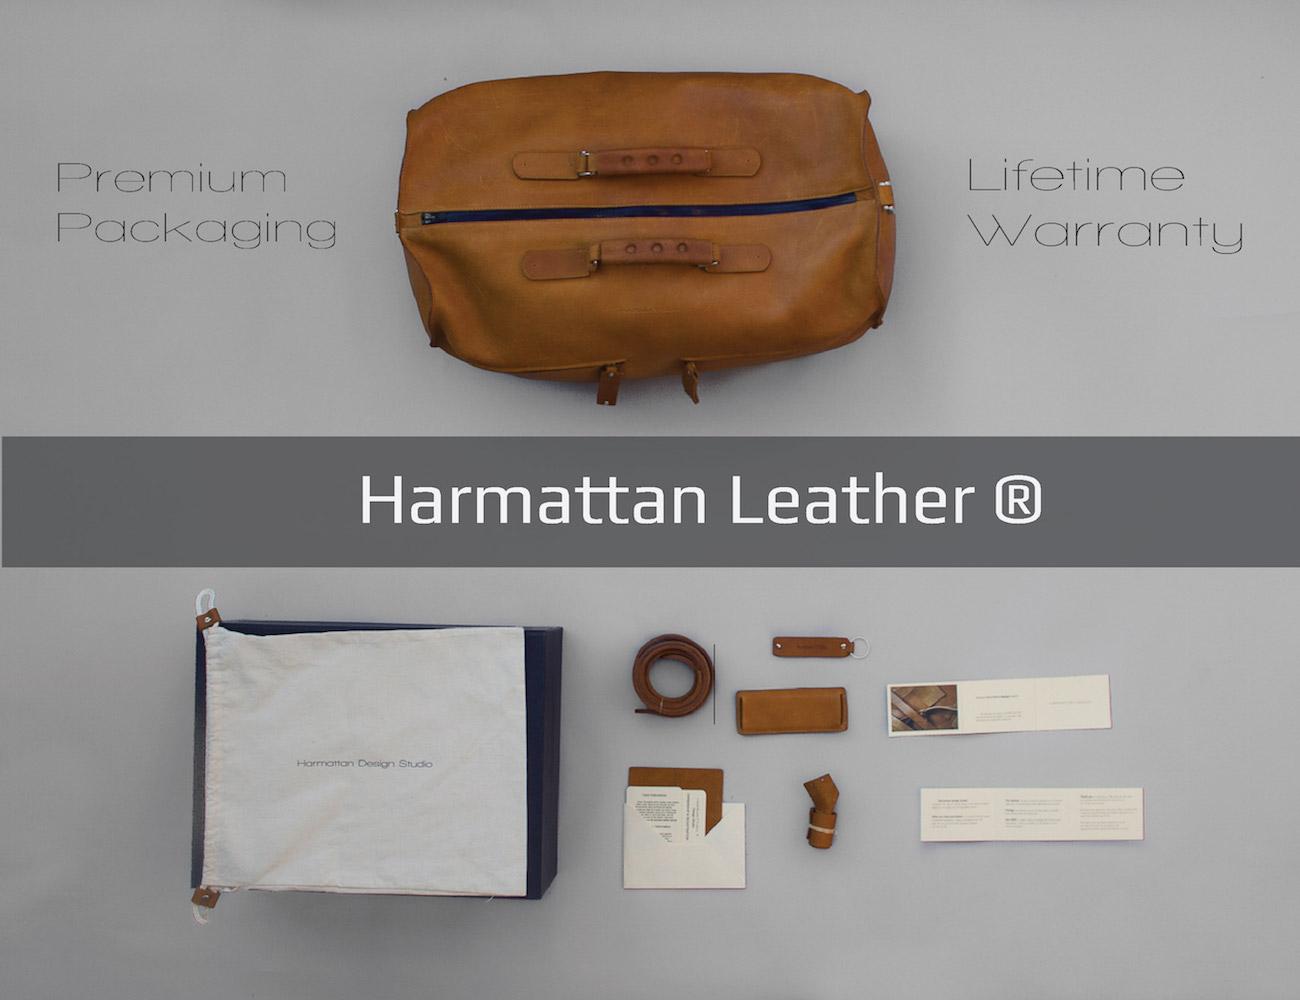 harmattan-leather-02